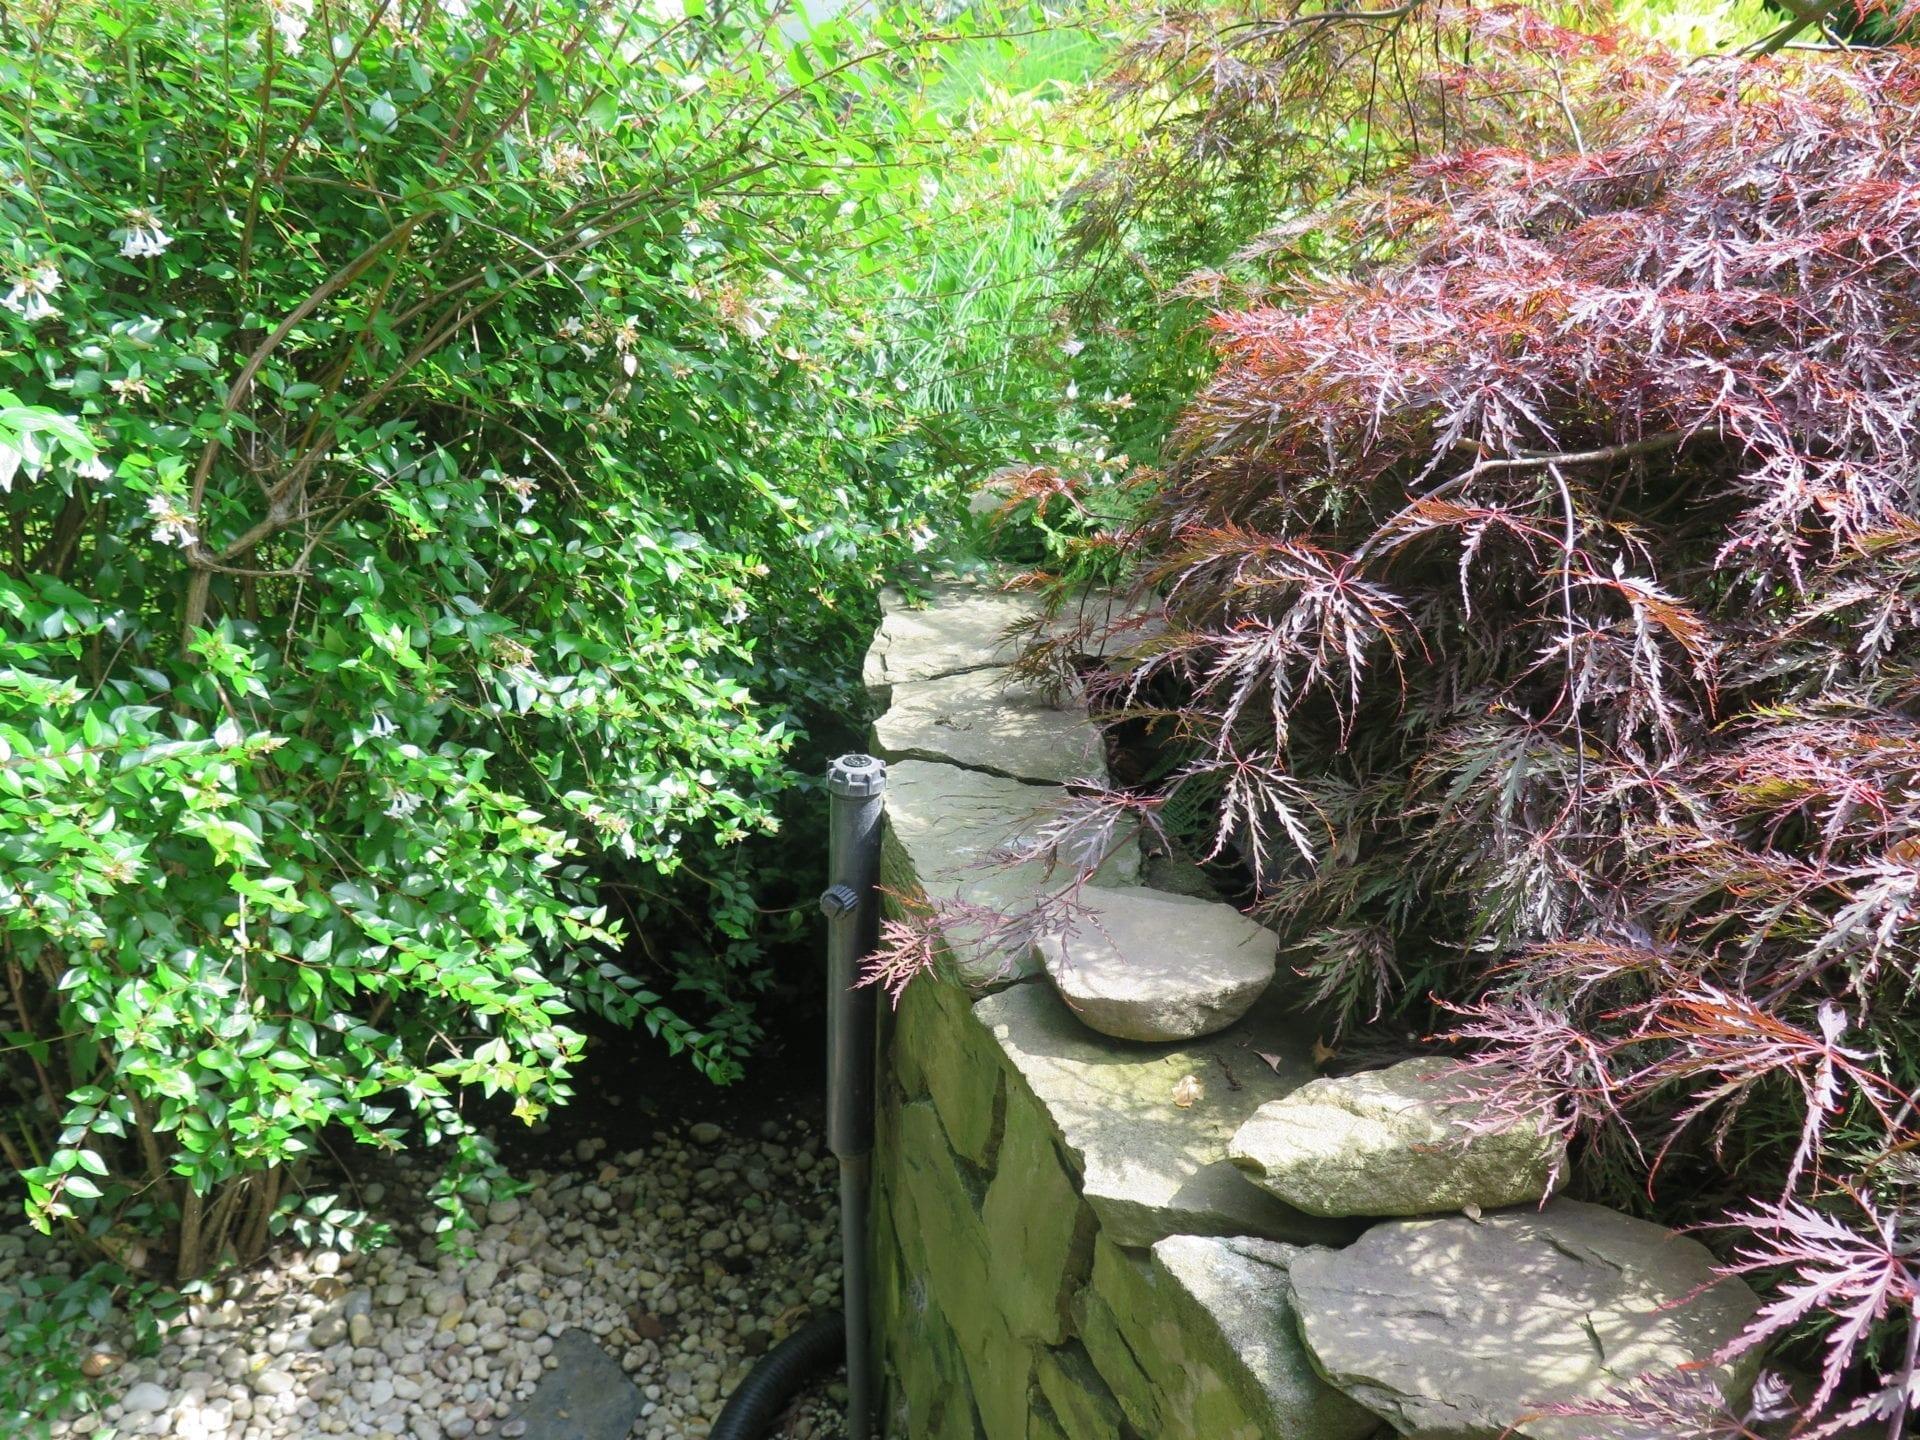 Overgrown Plants